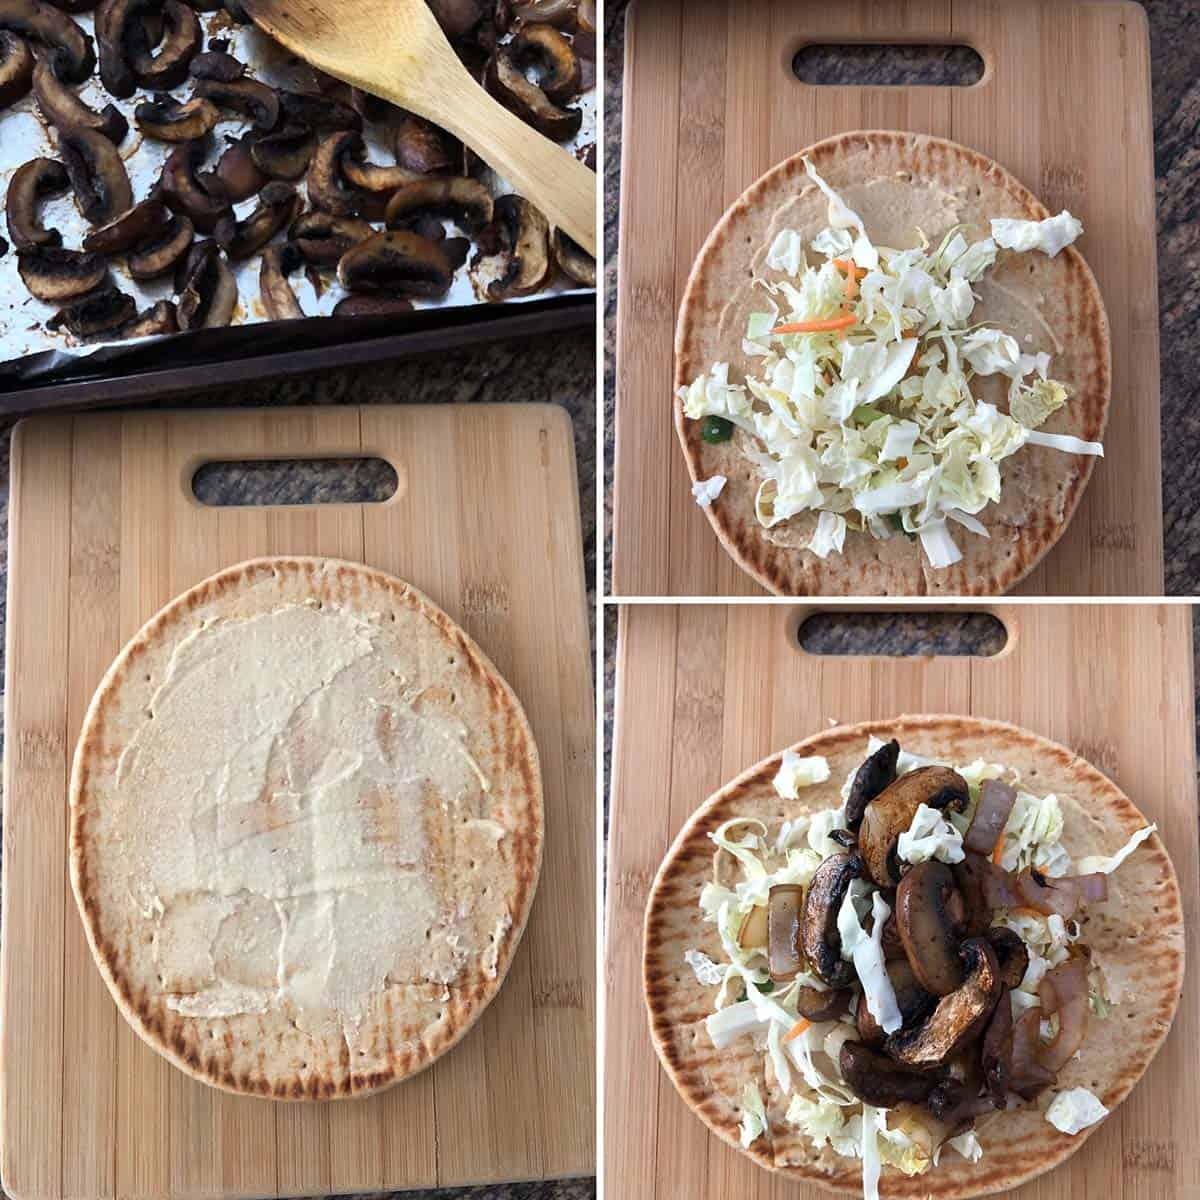 Step by step photos showing the making of Greek Mushroom Pita sandwich